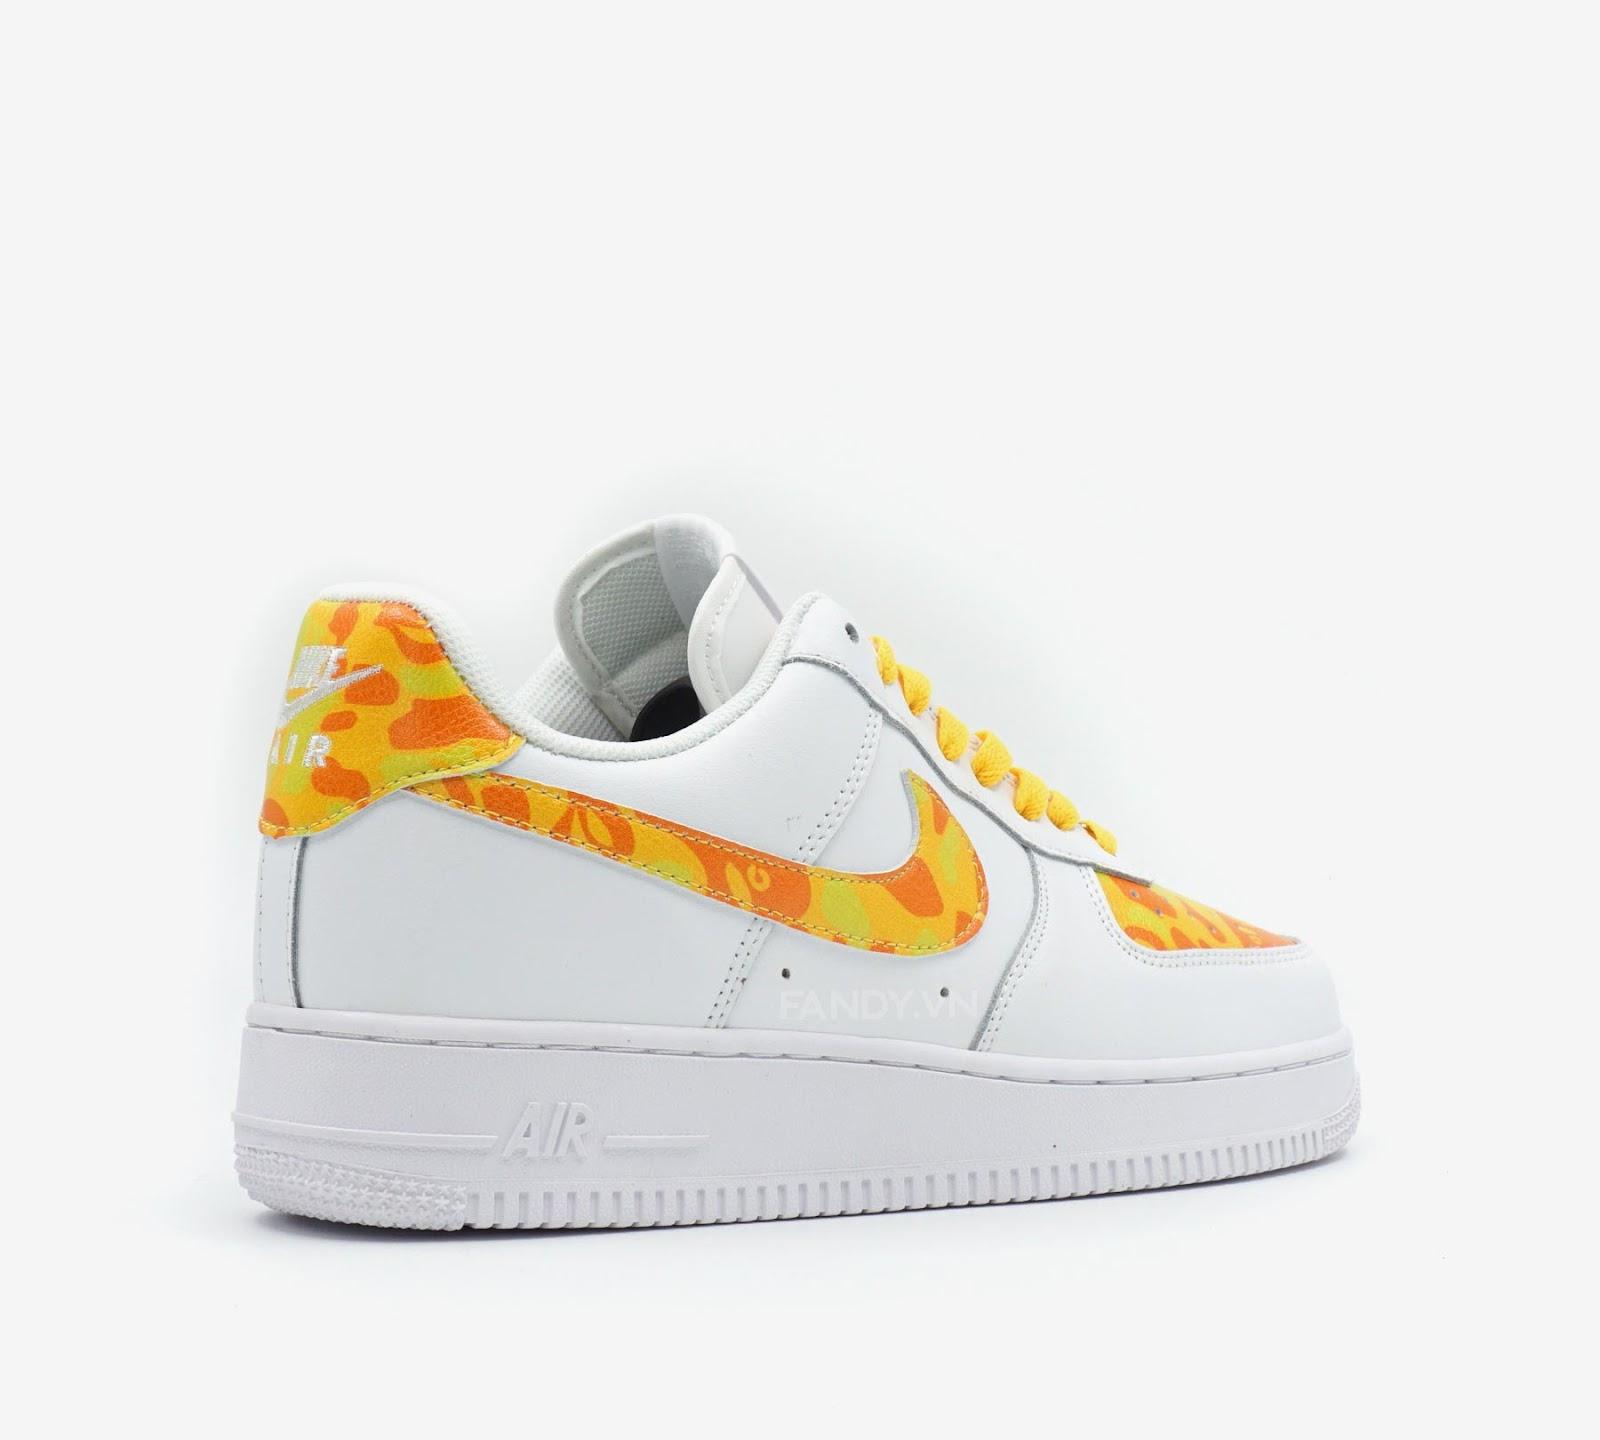 Giày Nike Air Force Low 1 07  Bape Fire